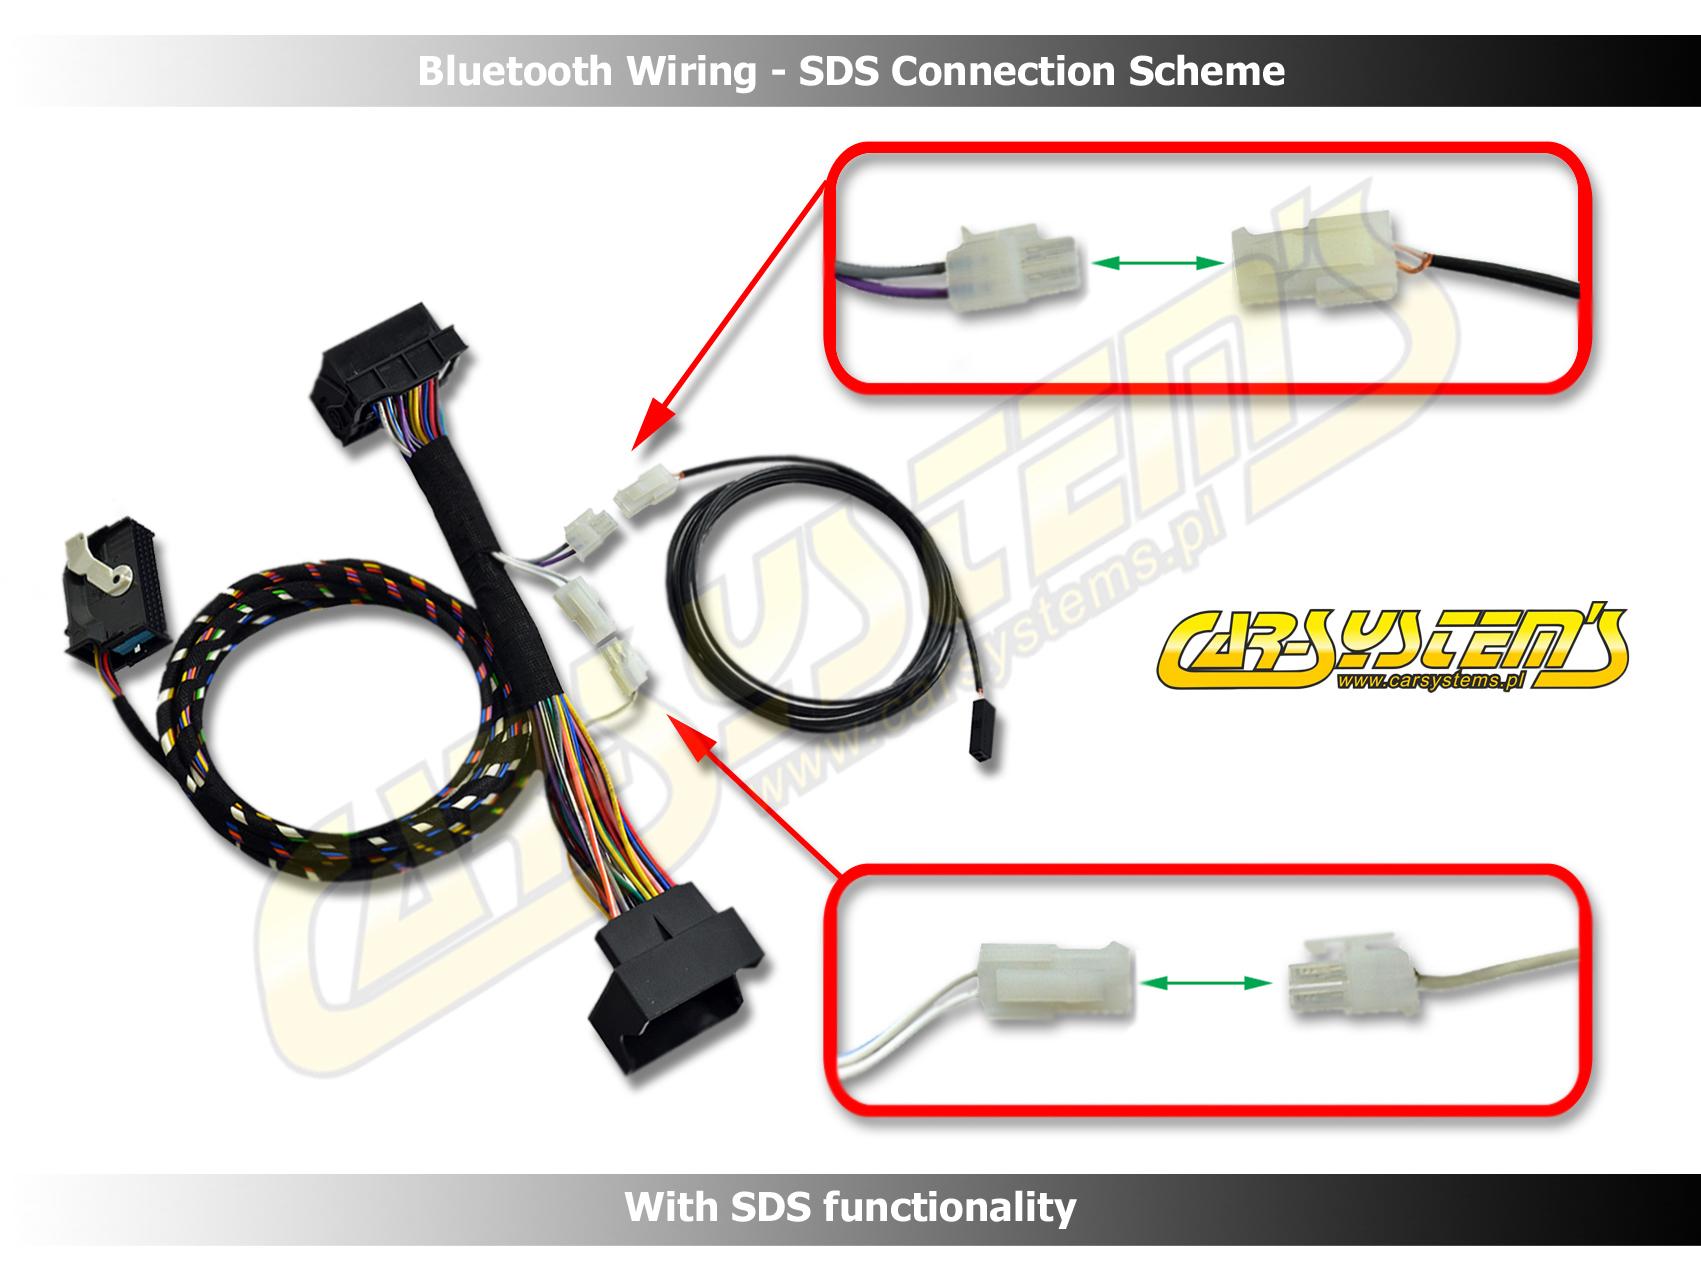 audi bluetooth sds wiring a3 a4 rns e concert 8p1862335. Black Bedroom Furniture Sets. Home Design Ideas